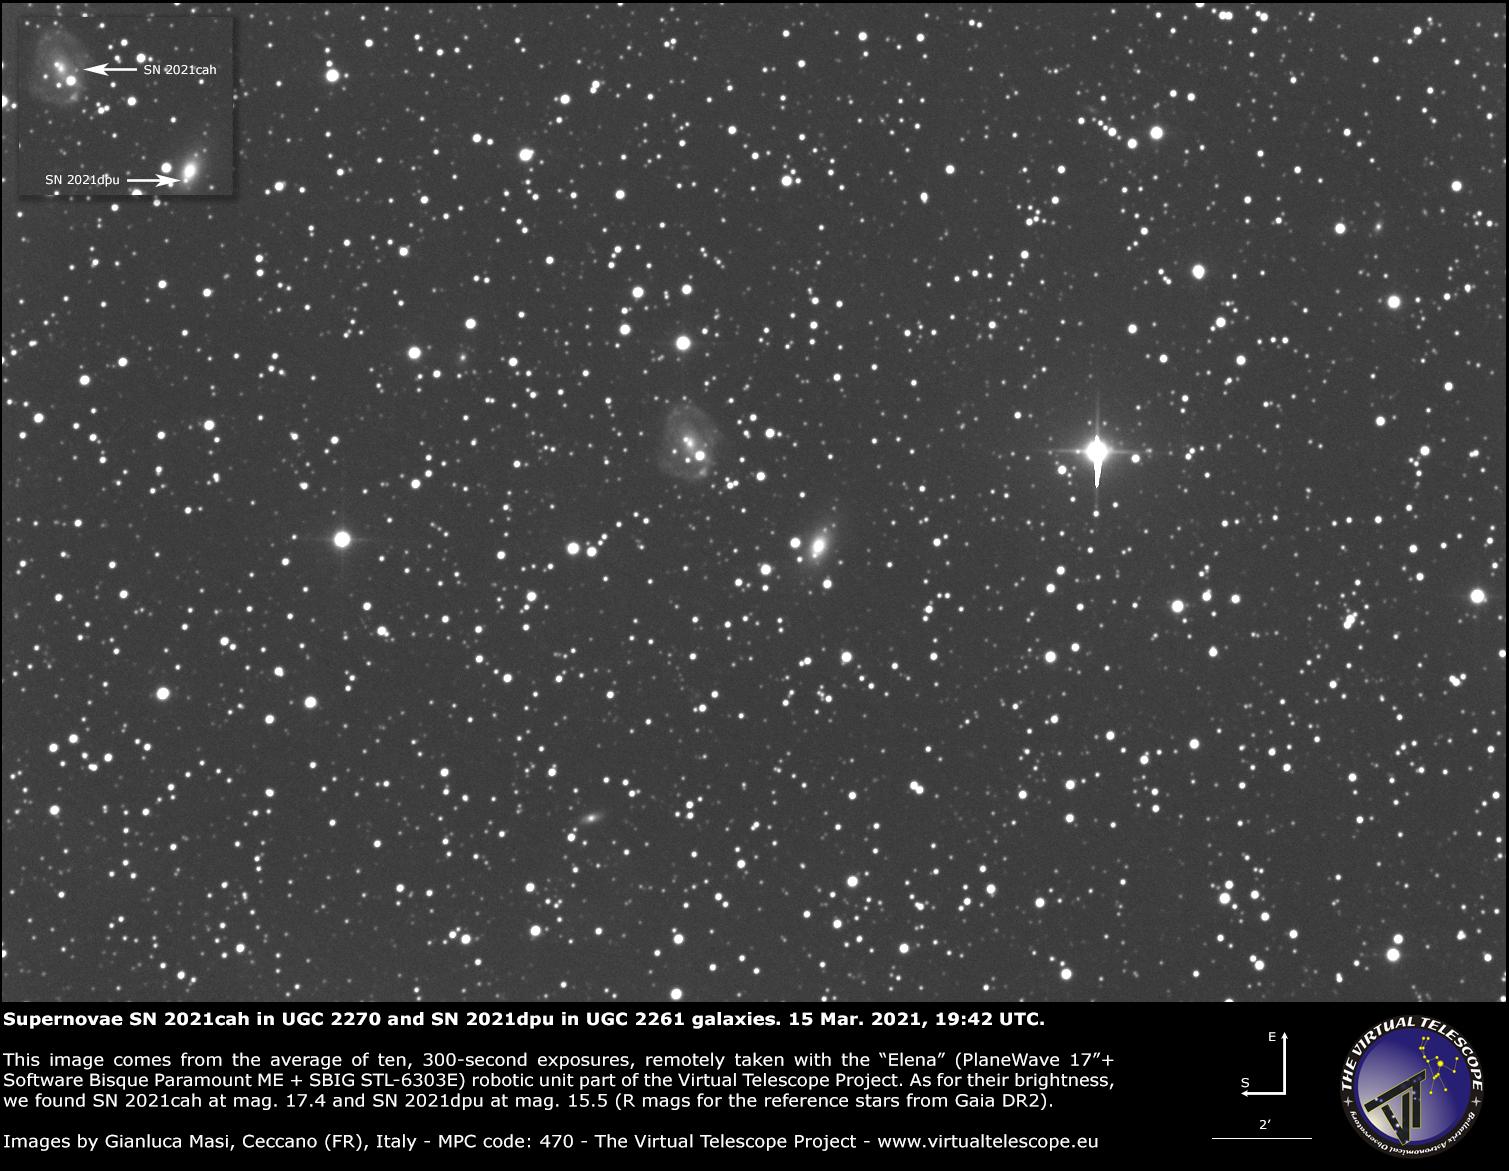 Supernovae SN 2021cah in UGC 2270 and SN 2021dpu in UGC 2261 galaxies: 15 Mar. 2021.